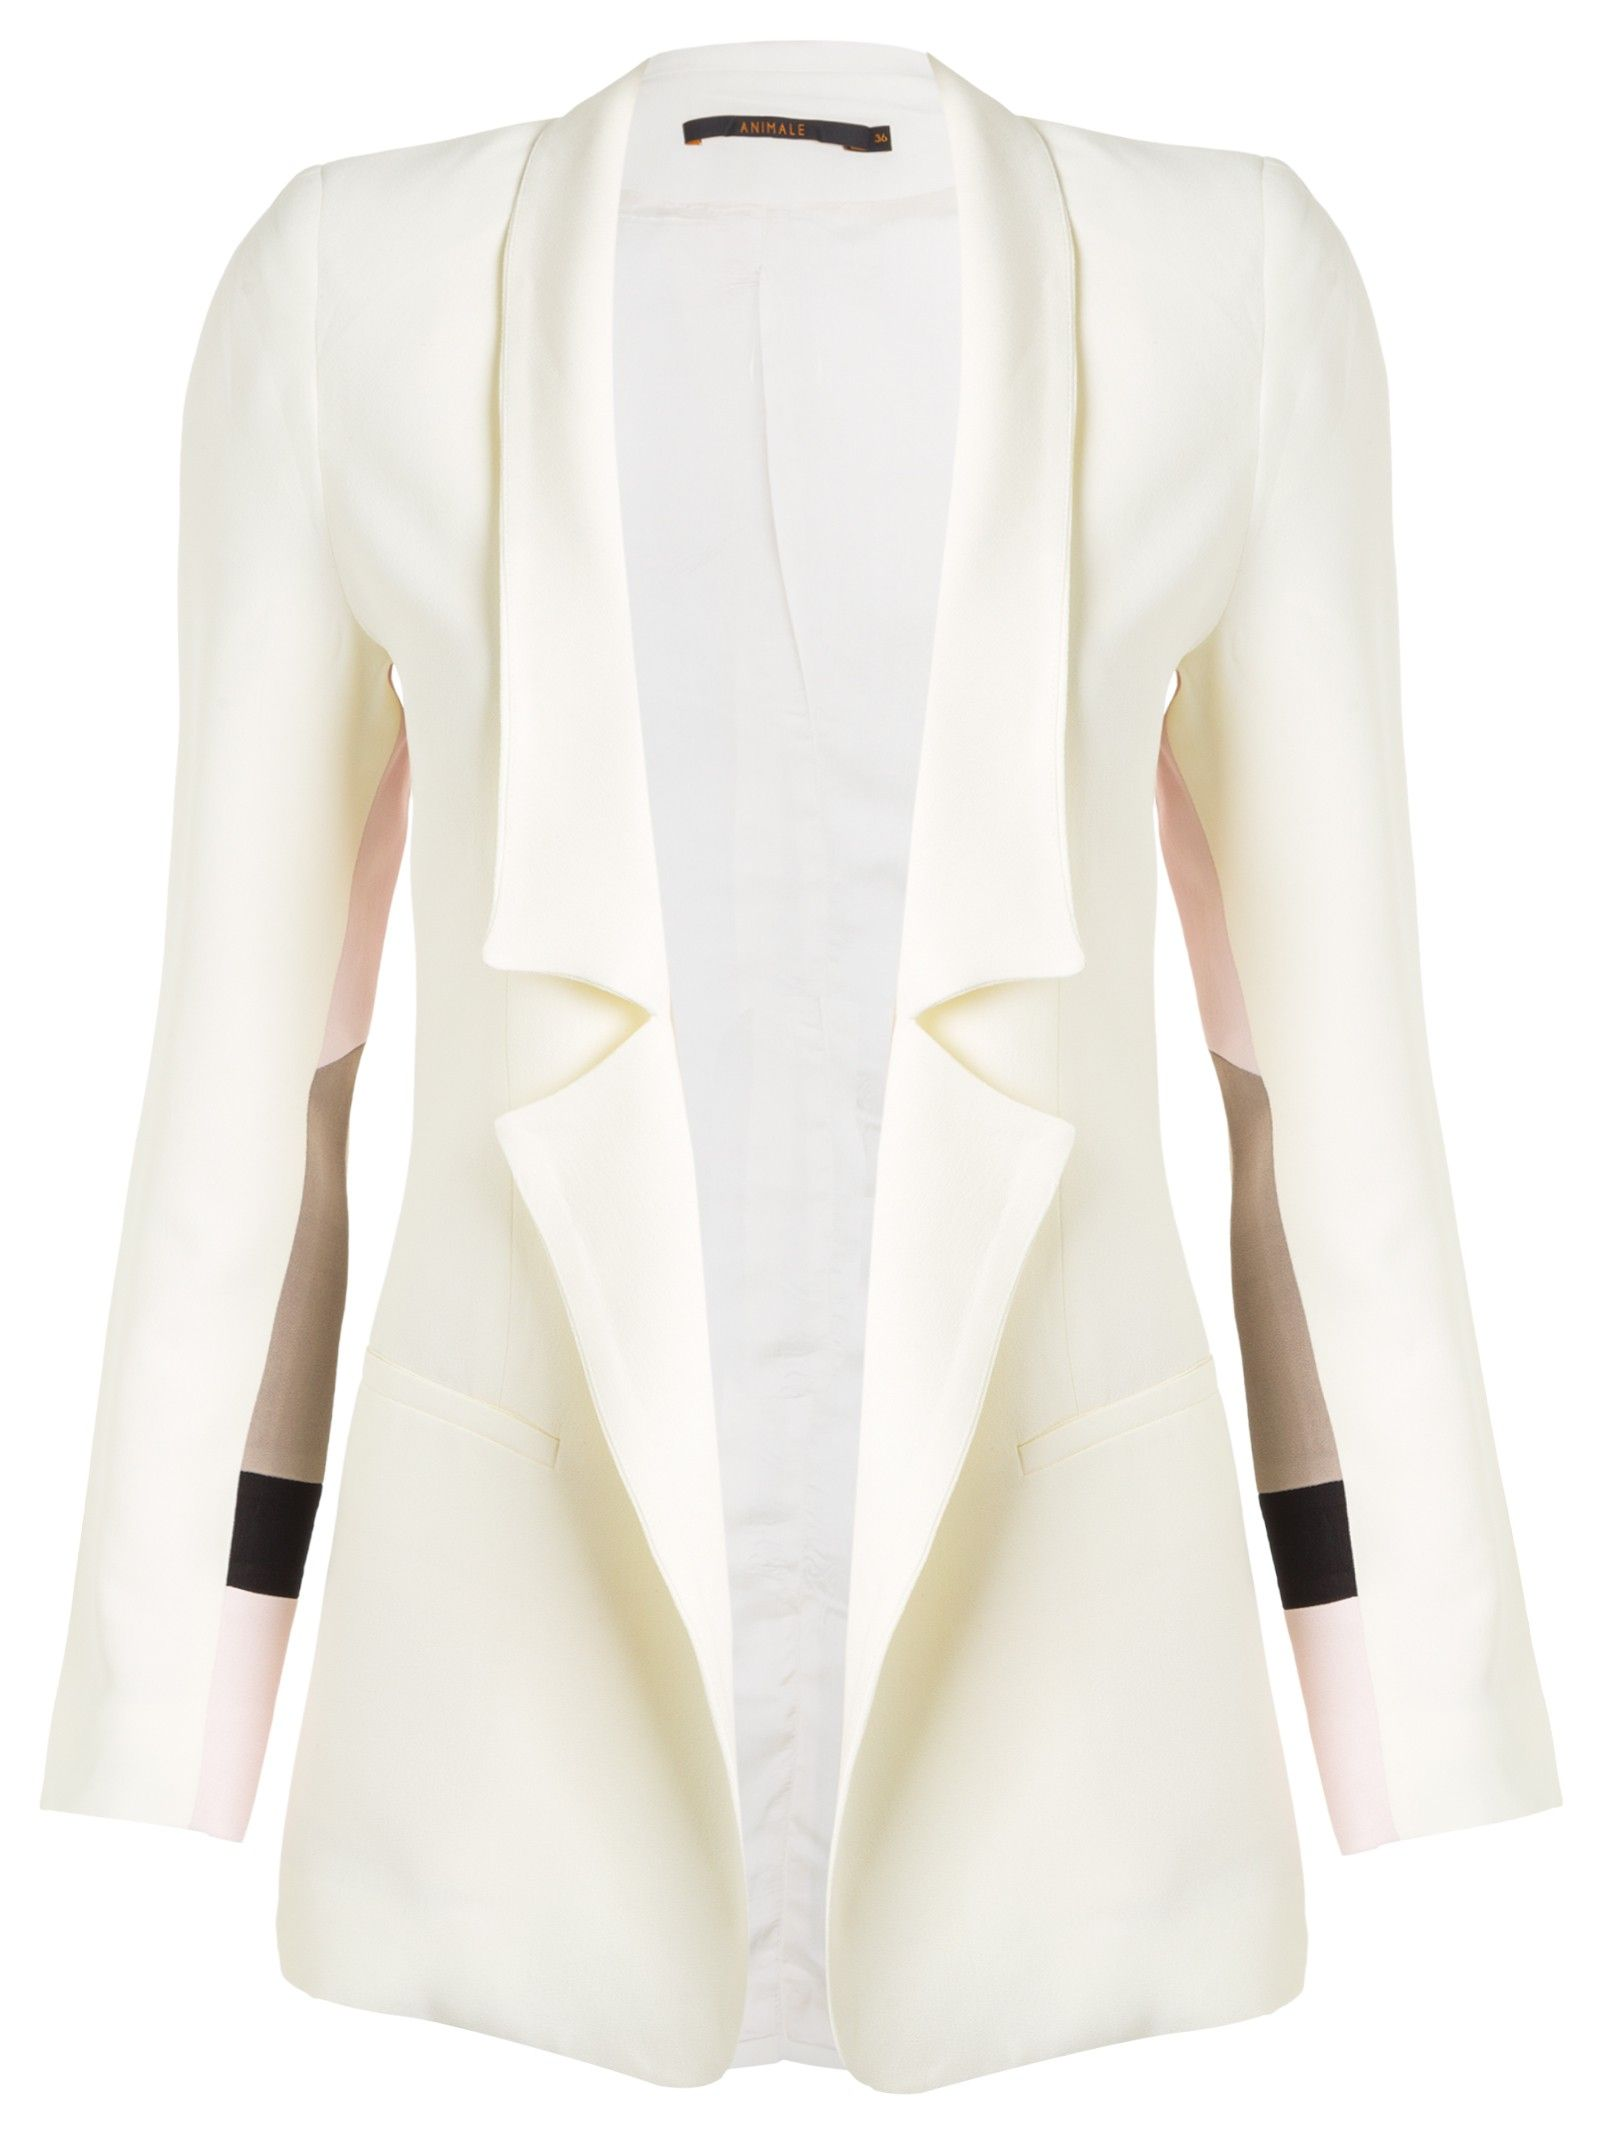 dress - How to white off wear blazer video